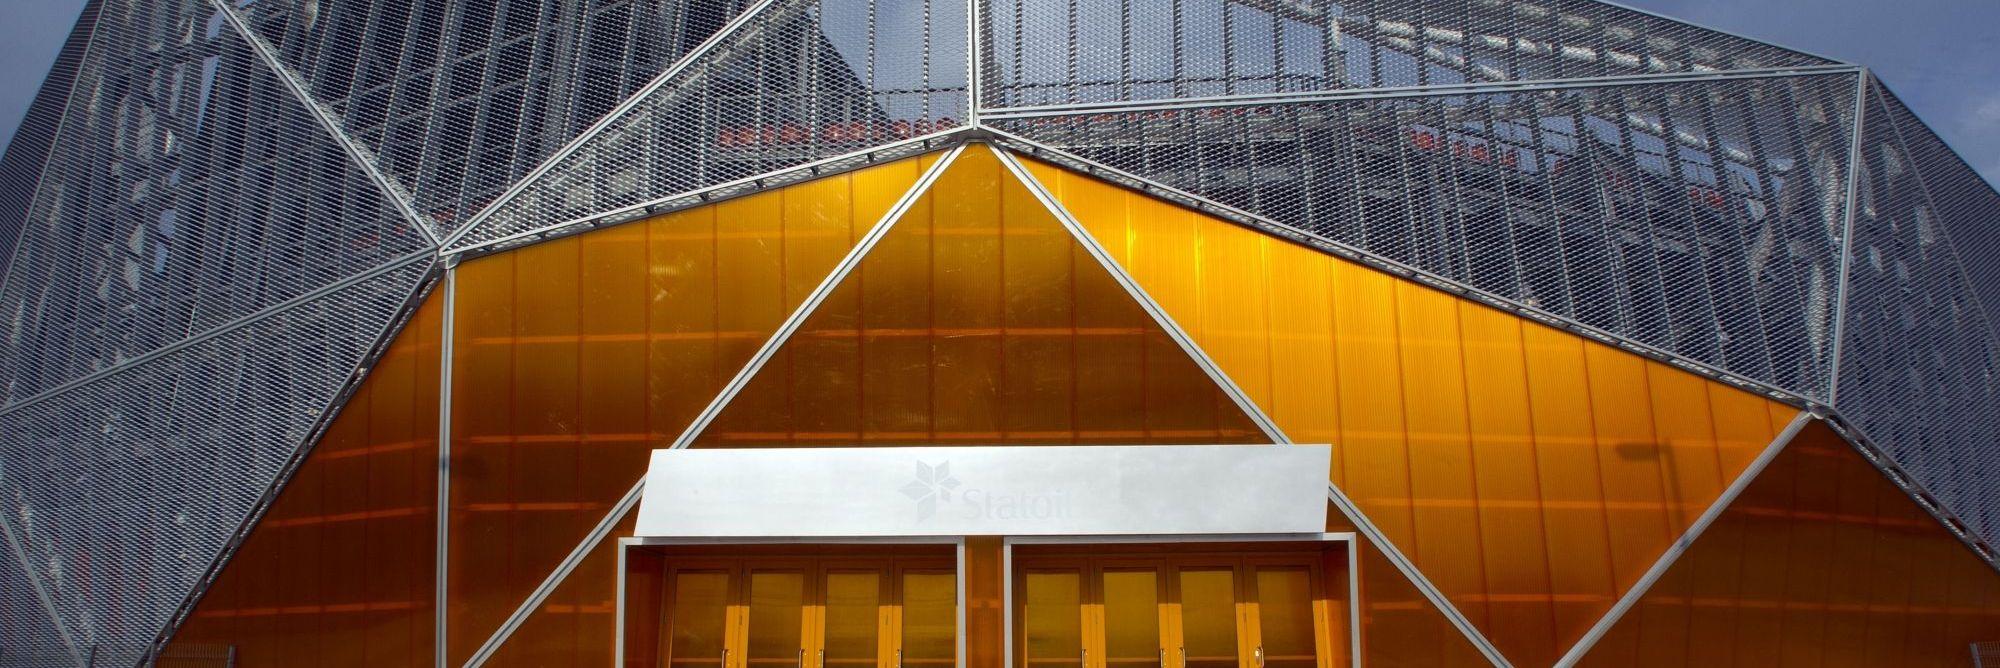 LEXAN THERMOCLICK sheet building system energy saving external wall cladding building walls high stiffness